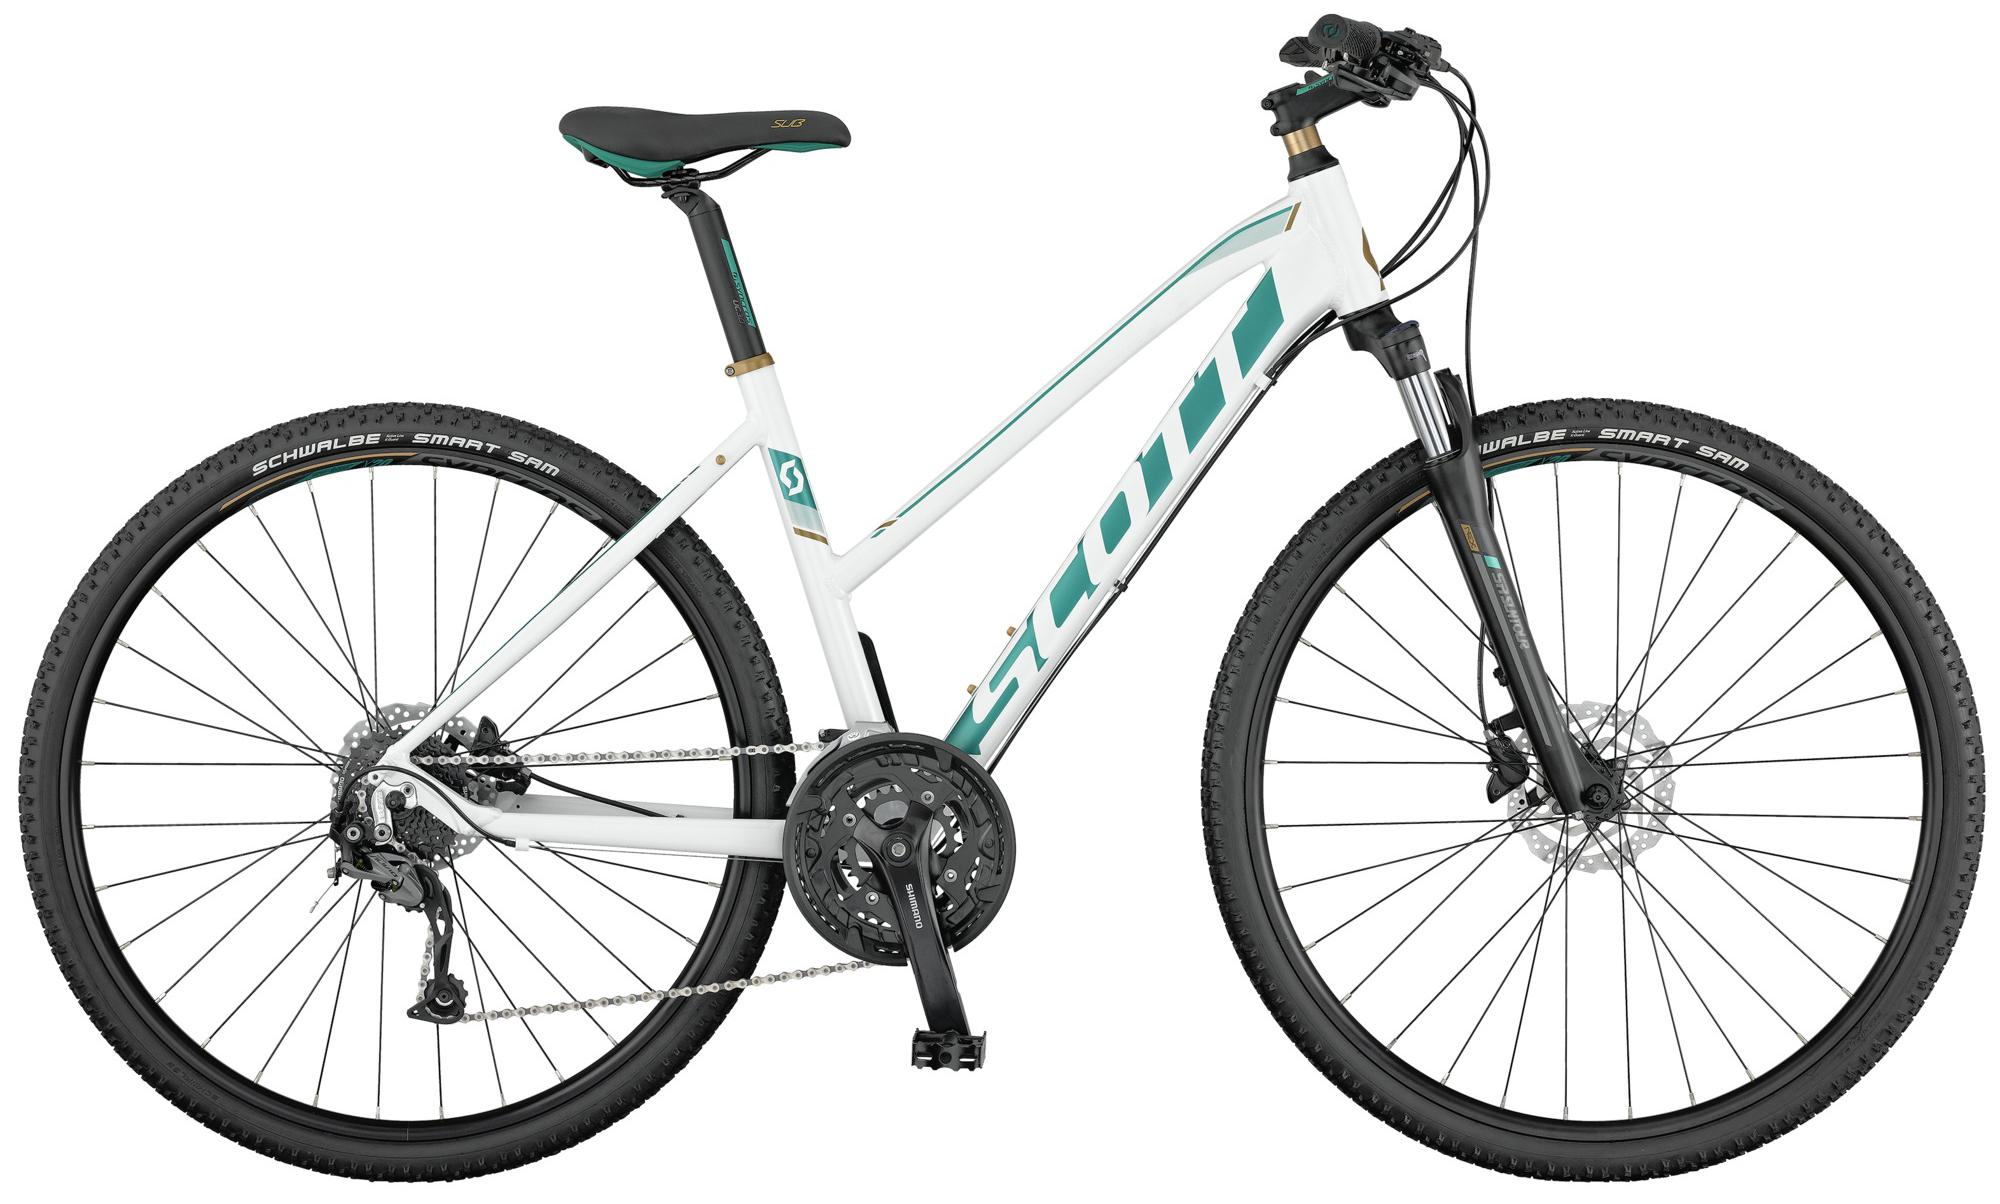 Scott Sub Cross 30 Lady City Bikes / Fitnessräder 2017